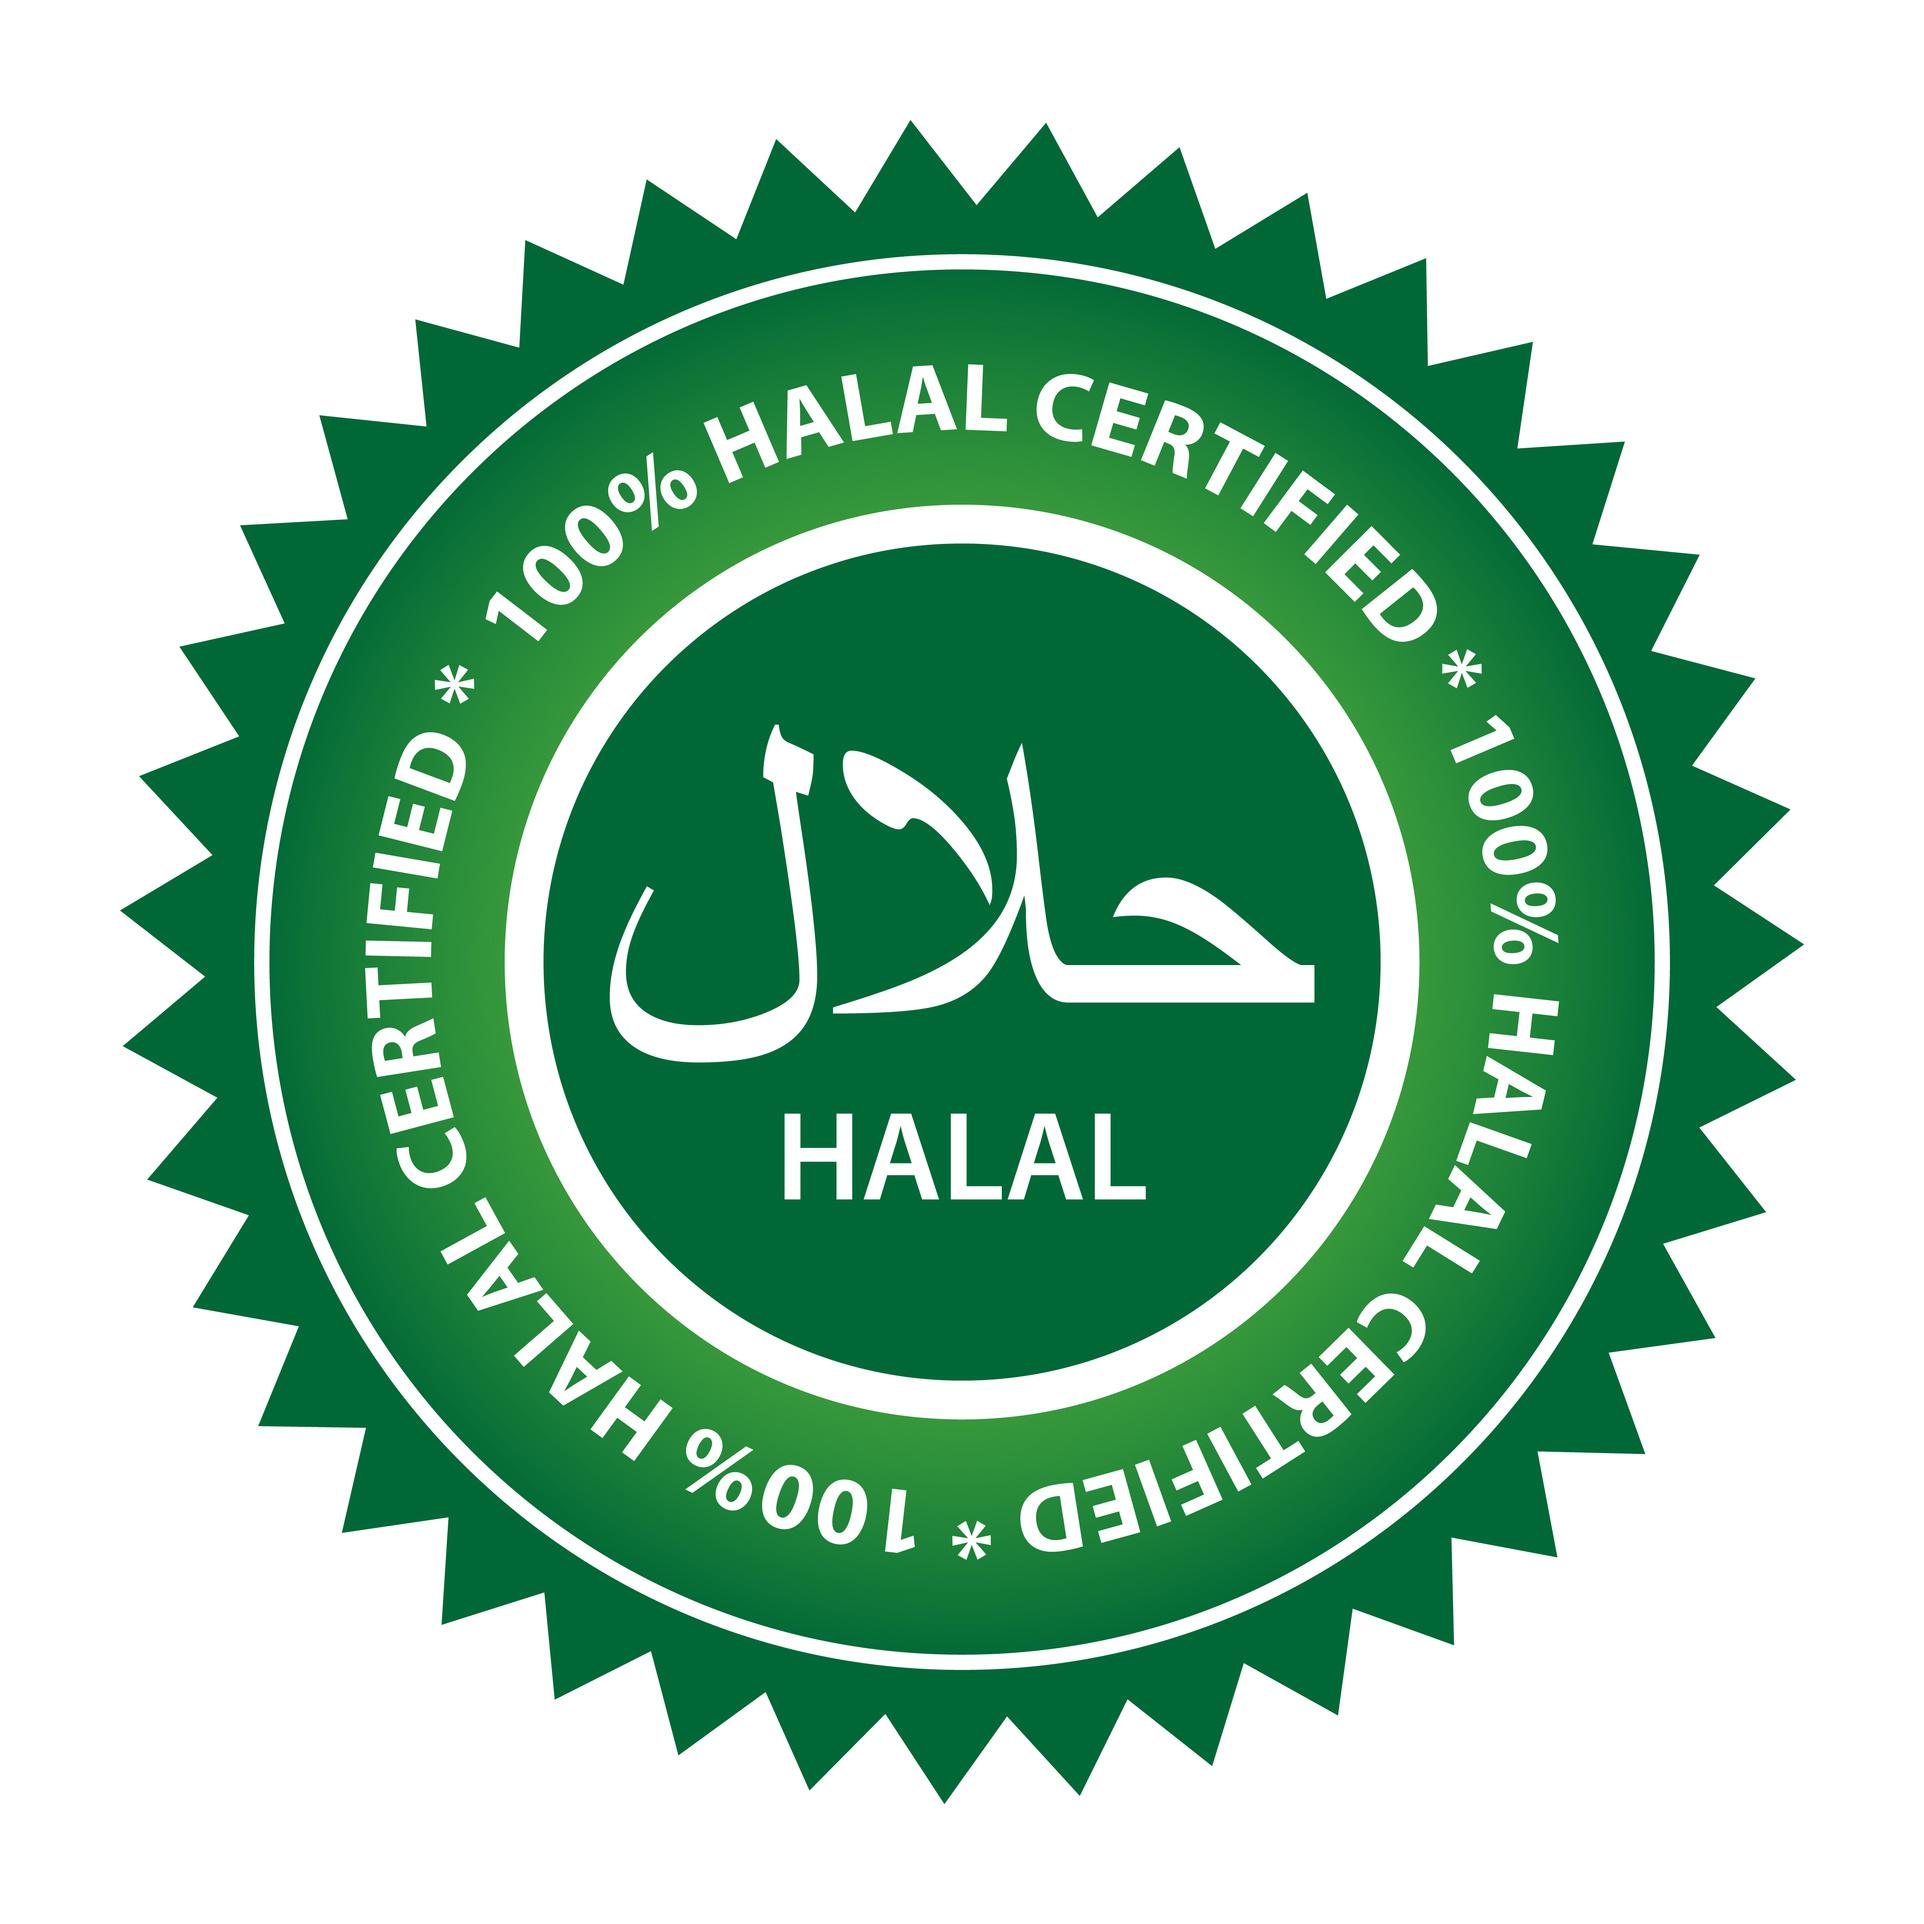 Halal - Muslime - Haram